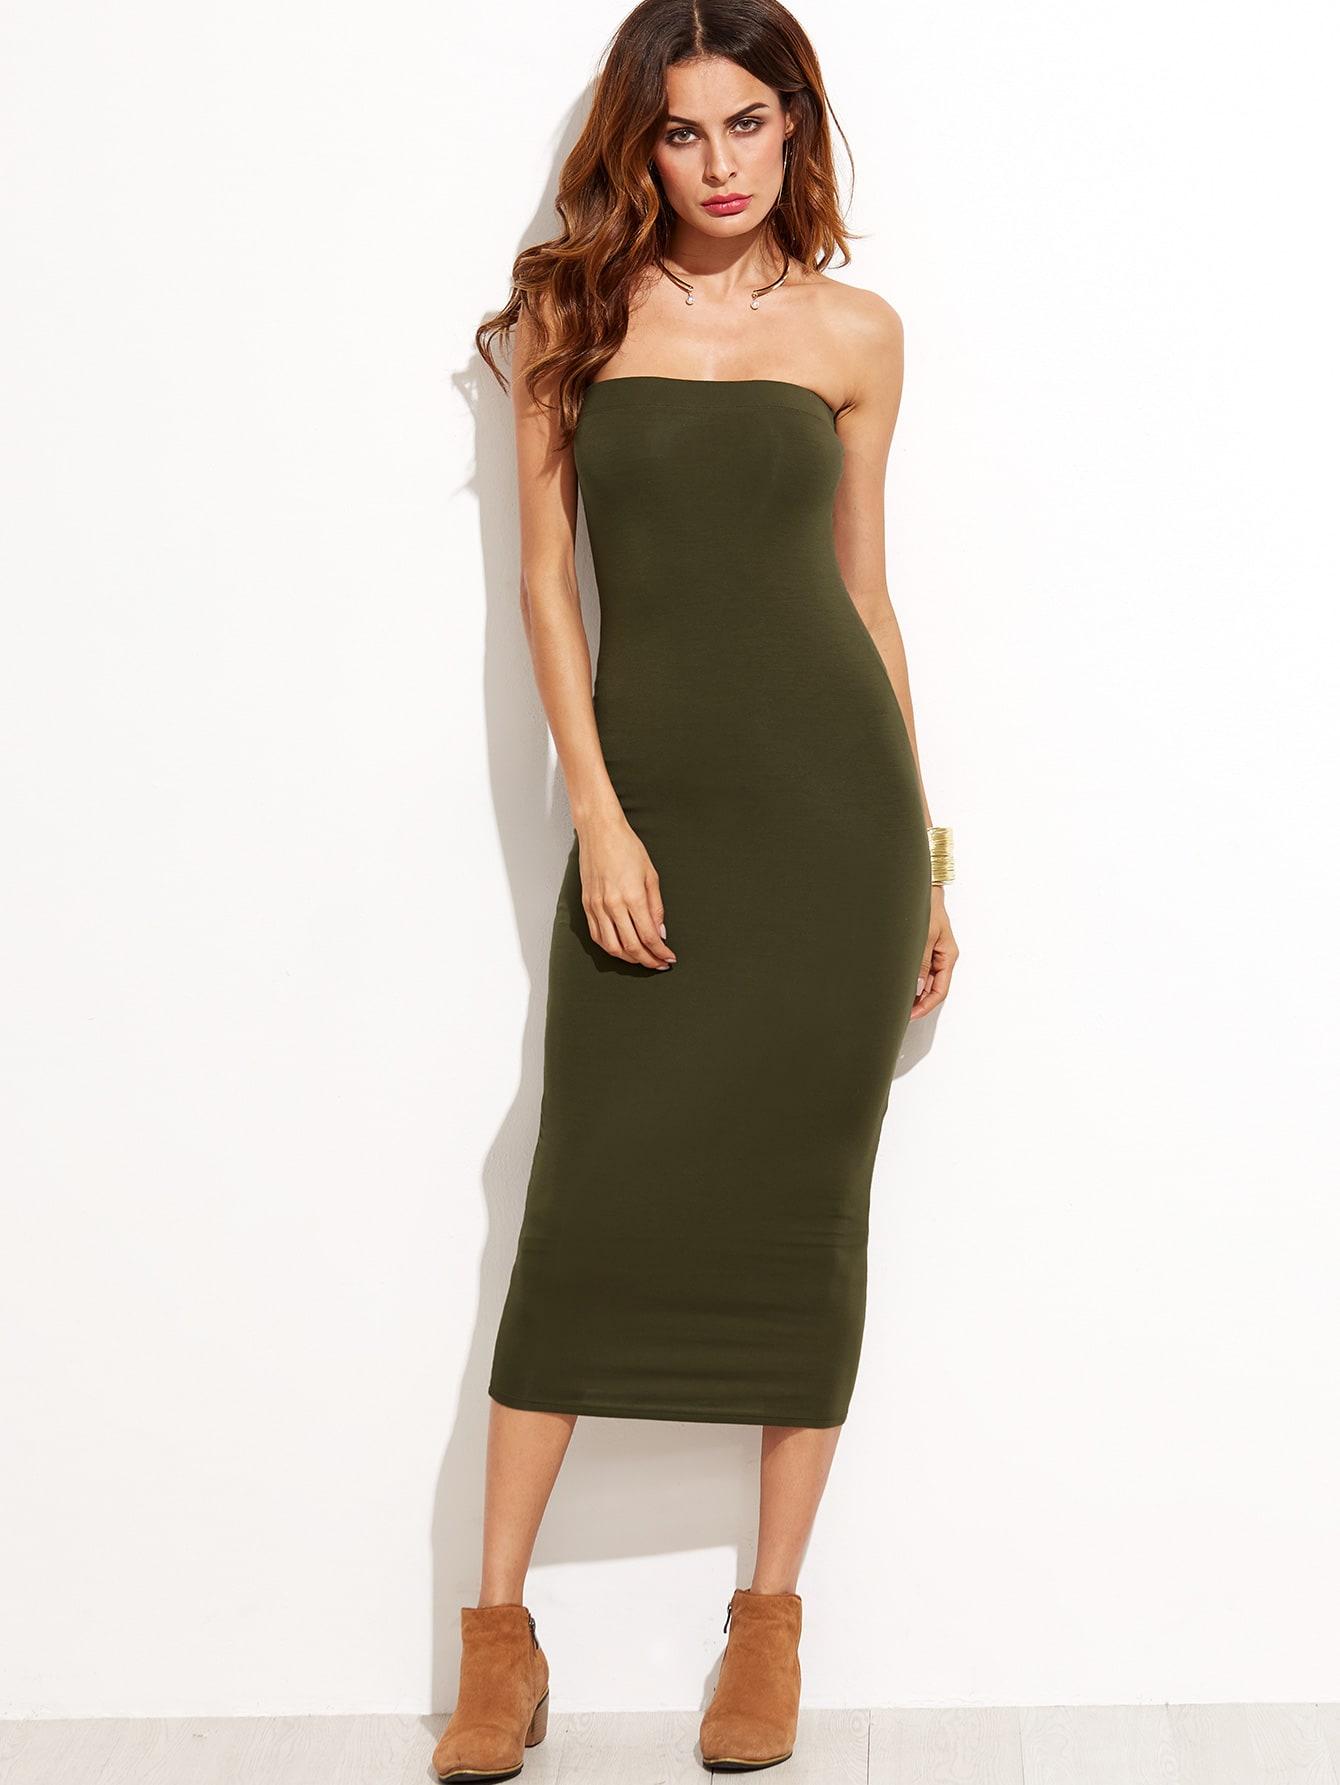 Green Tube Dress